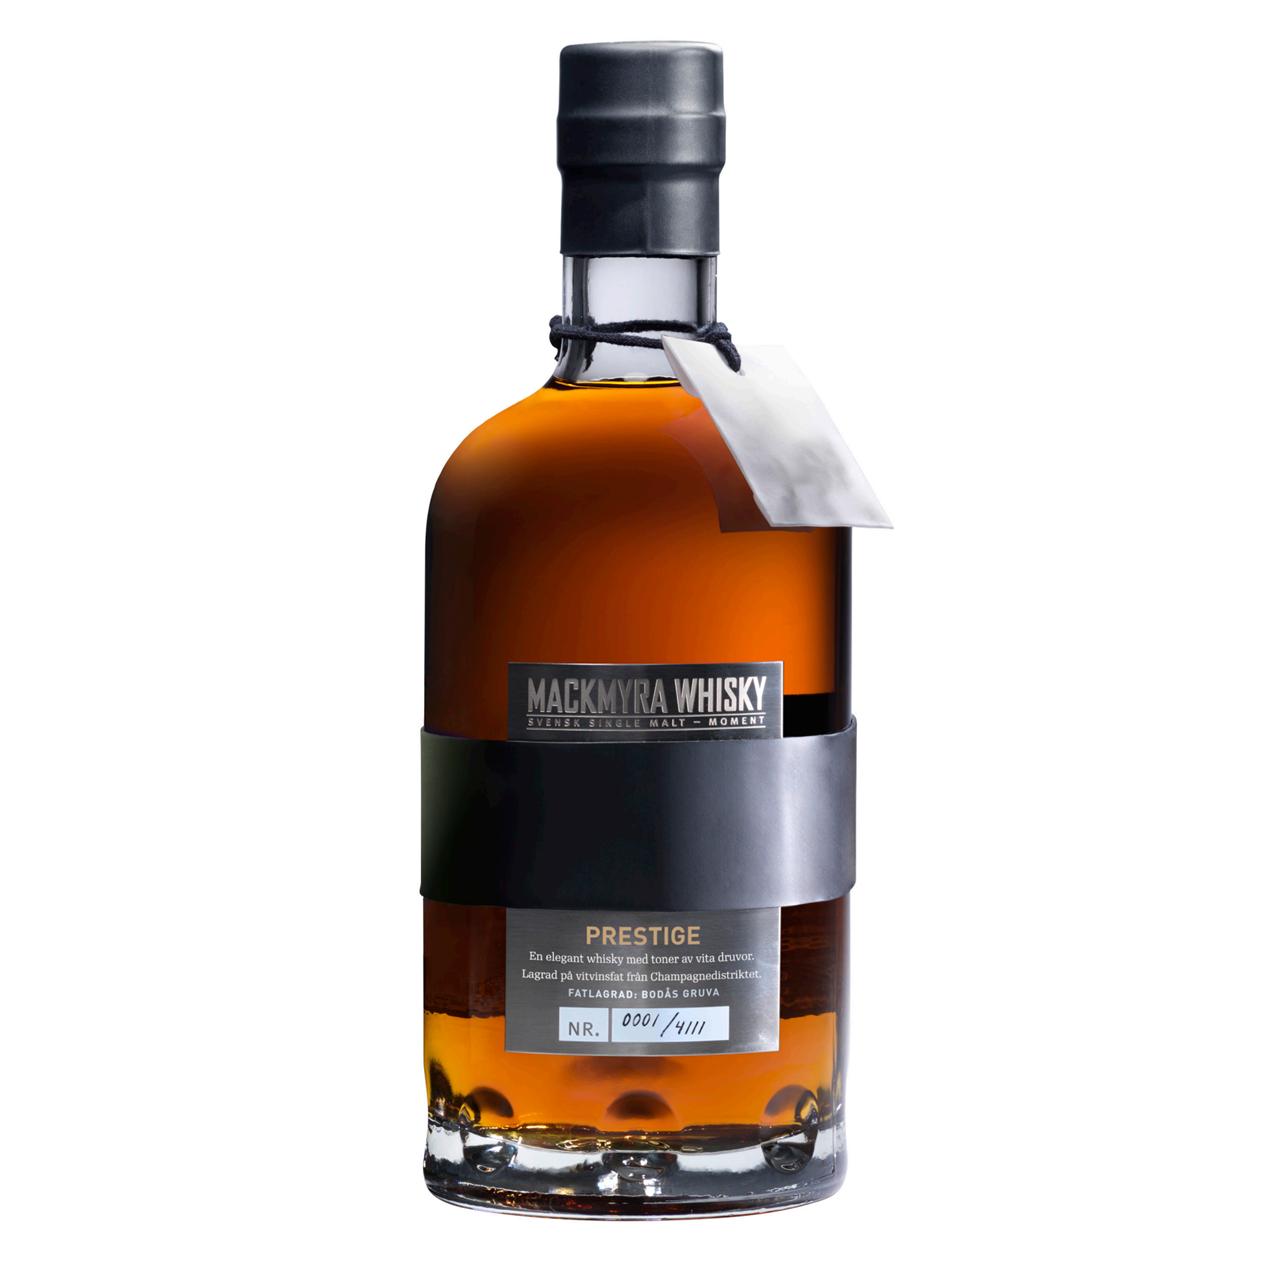 Nordic whisky #193 - Mackmyra Moment Prestige (24)